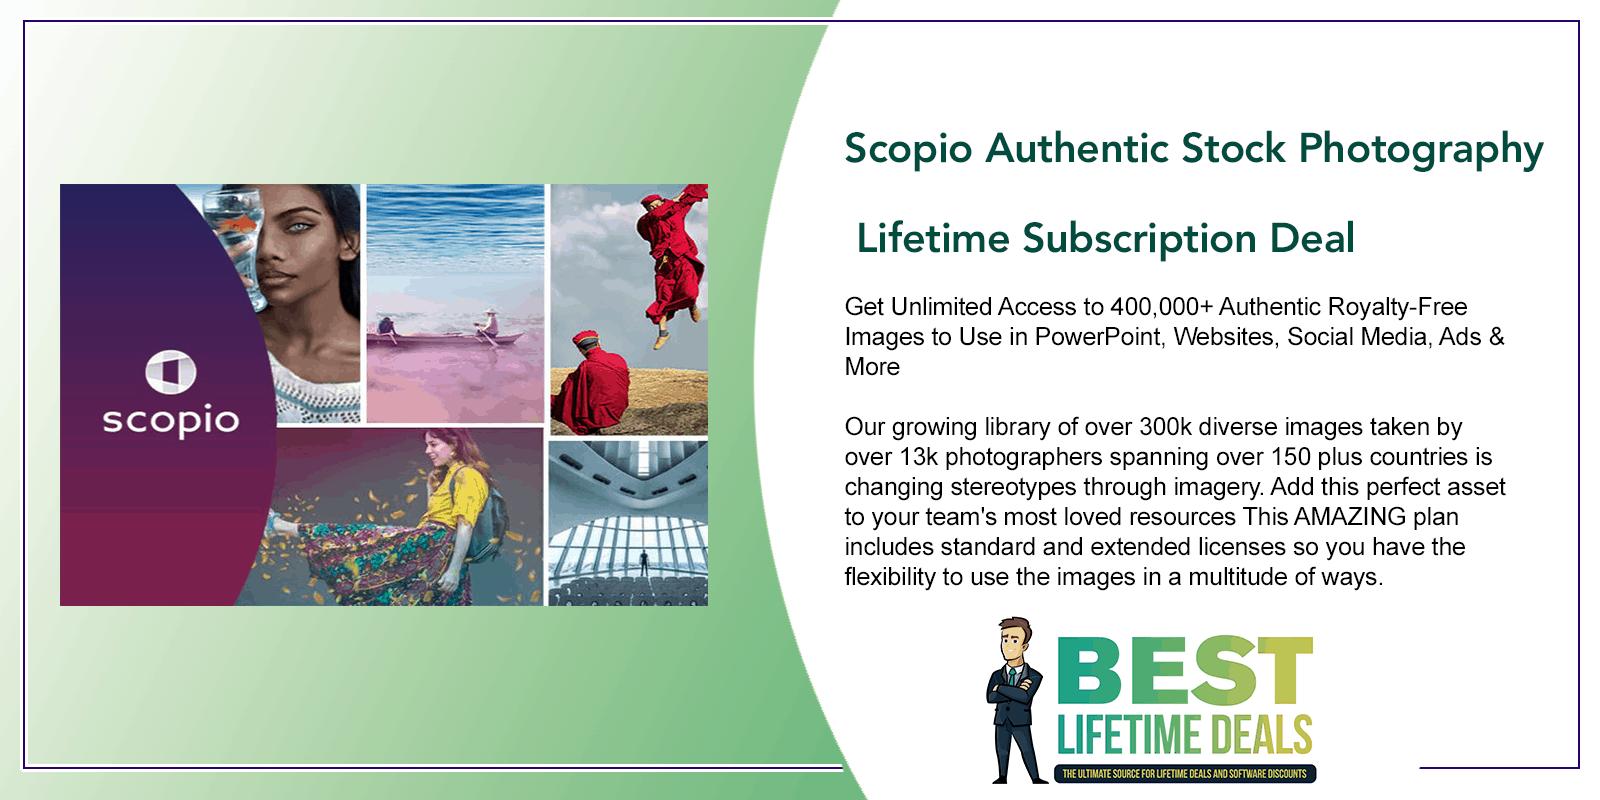 Scopio Authentic Stock Photography Featured Image